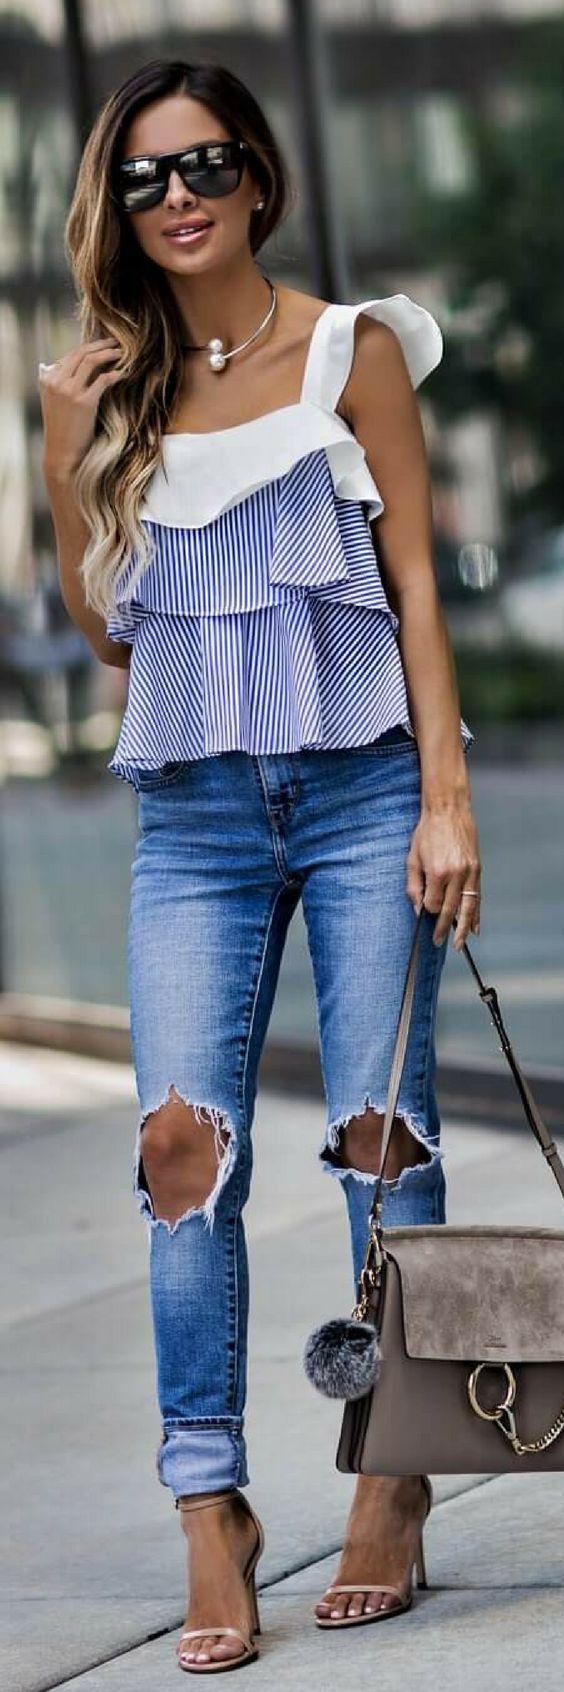 FEMININE RUFFLES⭐️ // Summer Outfit Idea by Mia Mia Mine